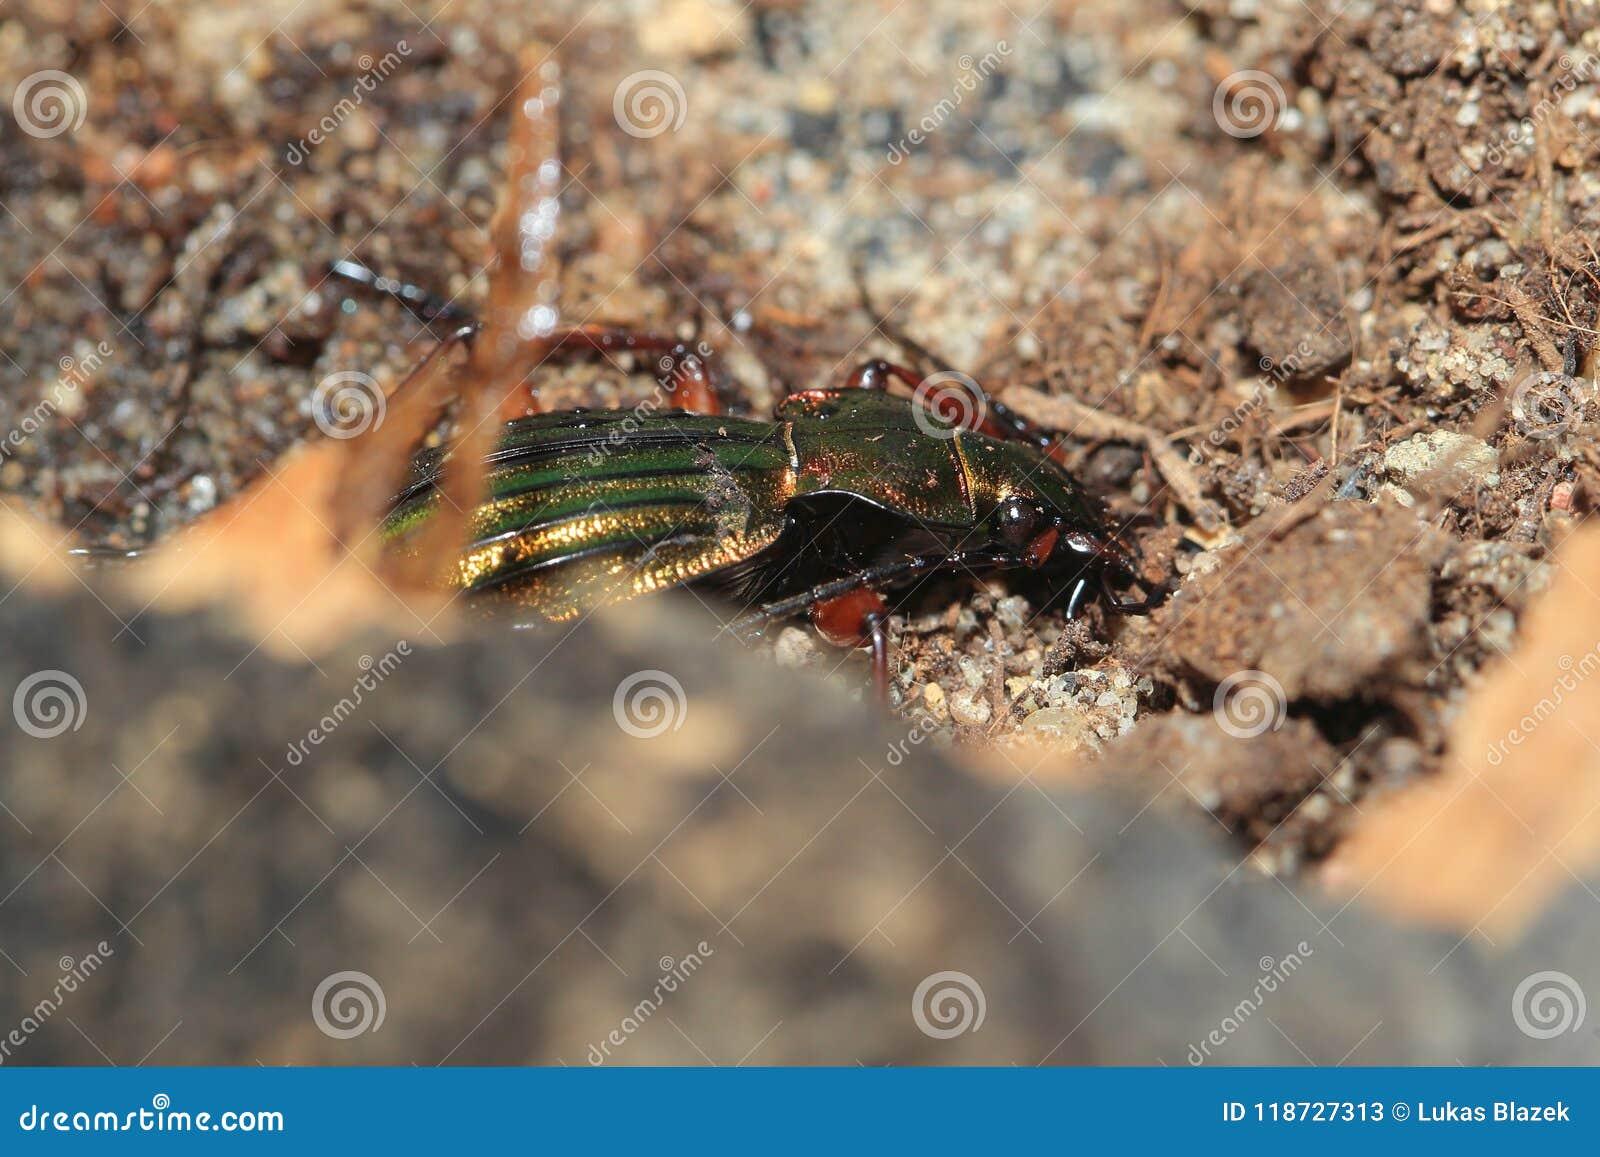 Golden ground beetle stock image  Image of wildlife - 118727313